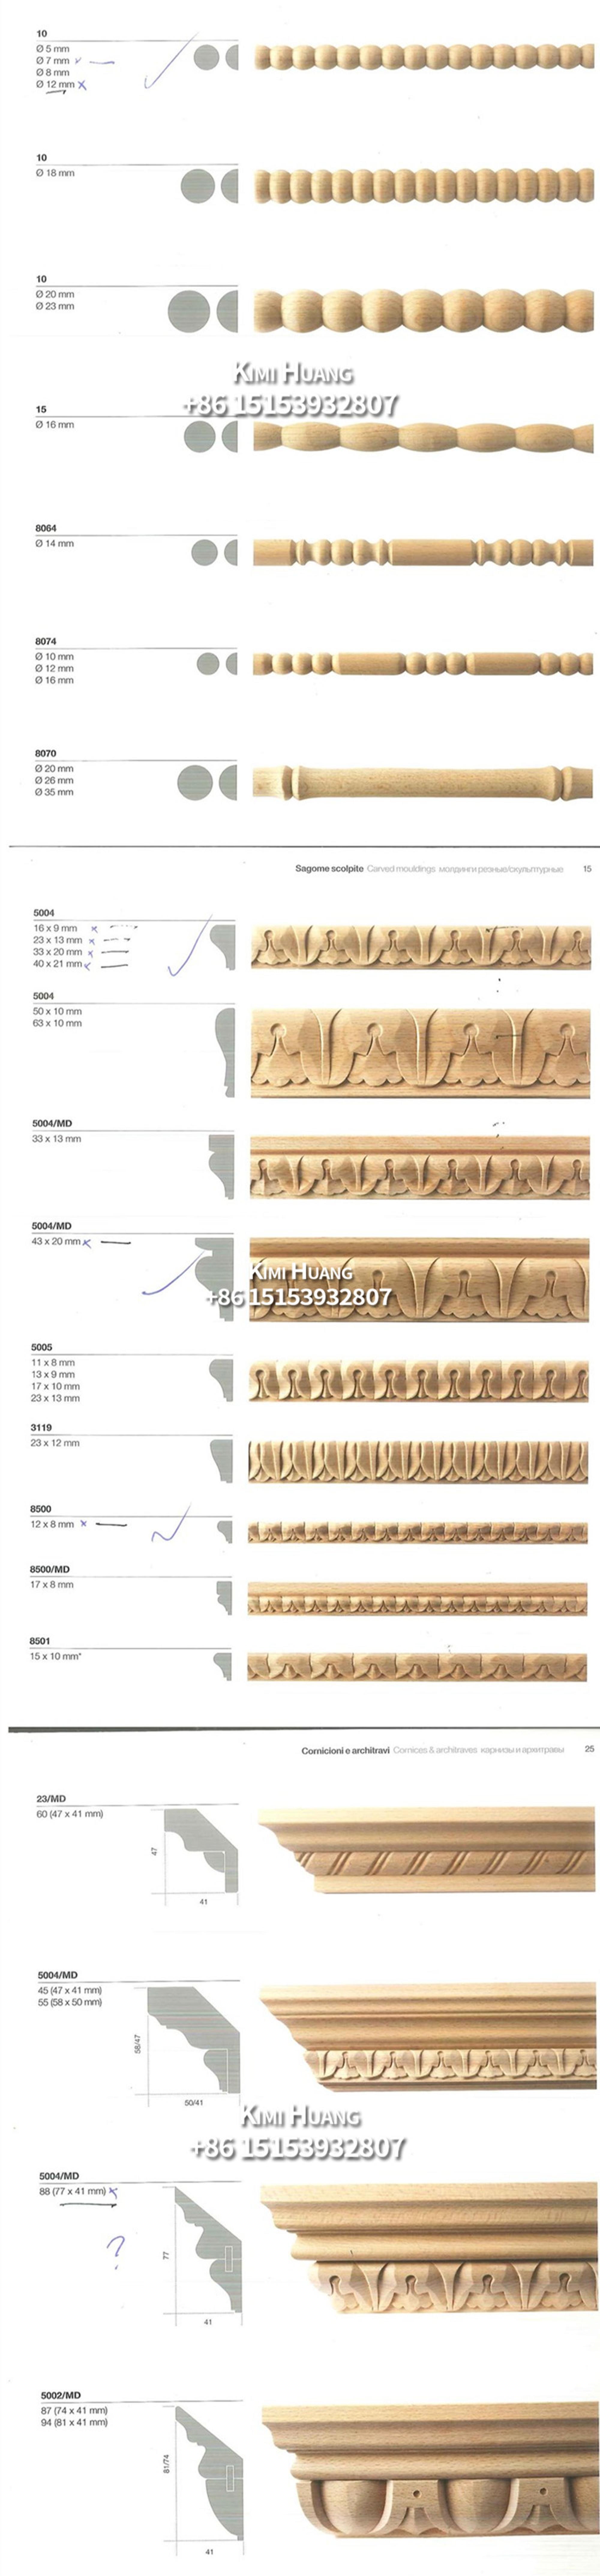 Hohe Qualität Engineered Holz Moulding Solide Holz Rahmen Leisten ...